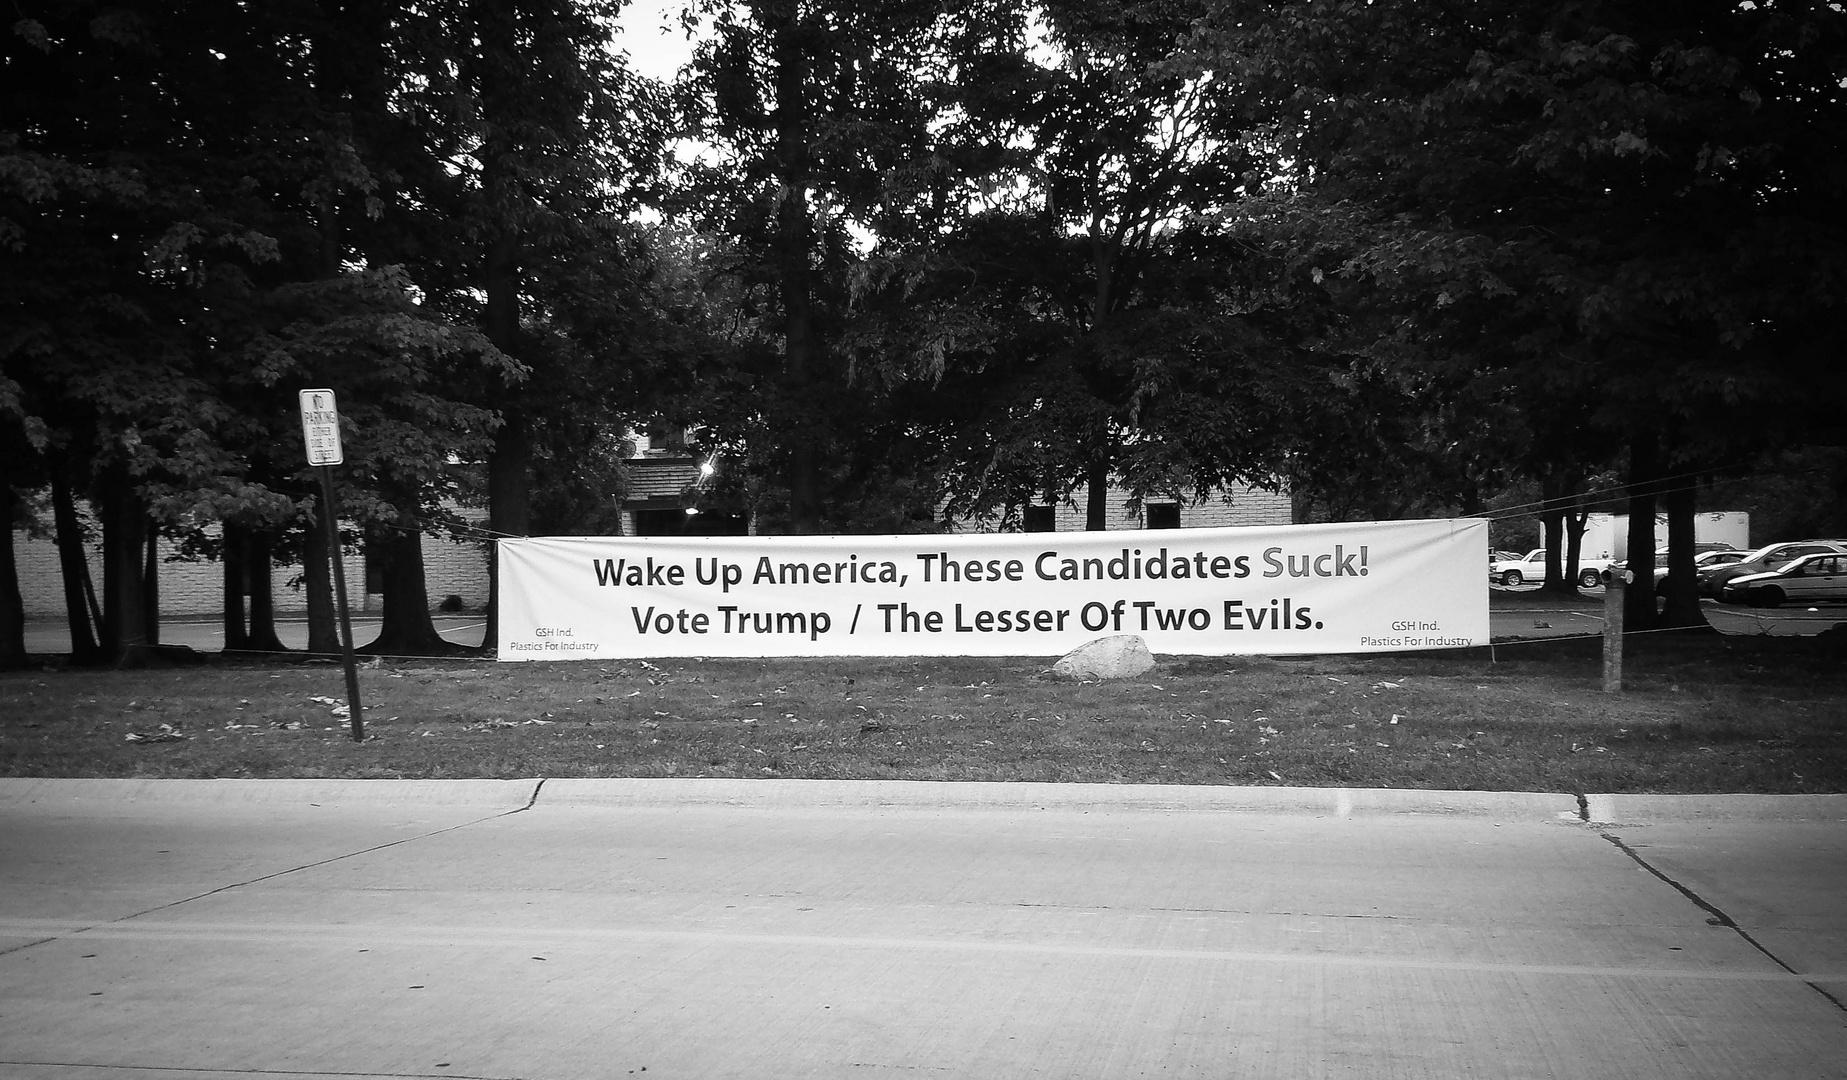 Politics - Lesser of two evils